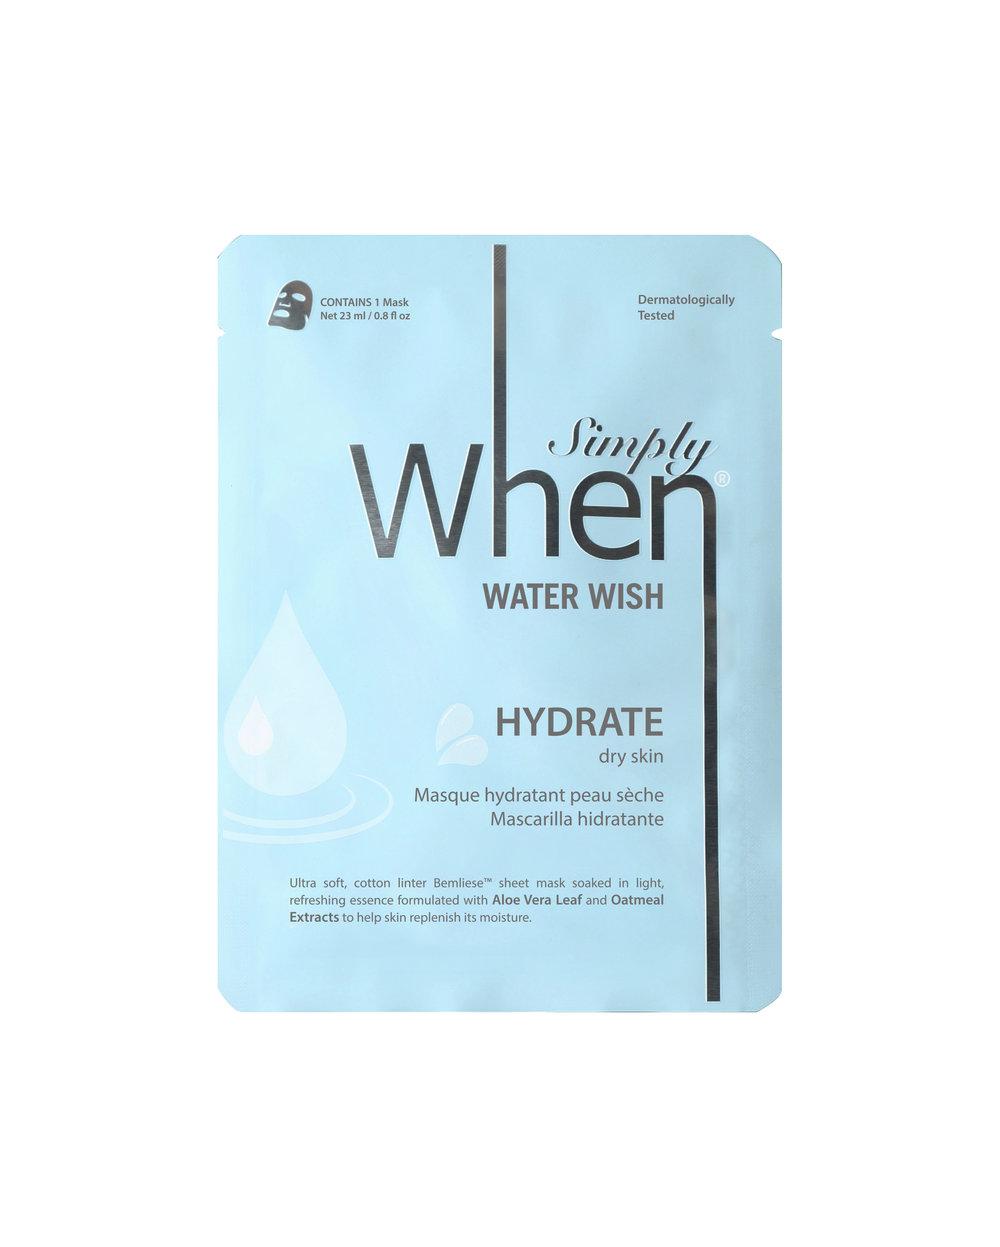 Water Wish sheet mask